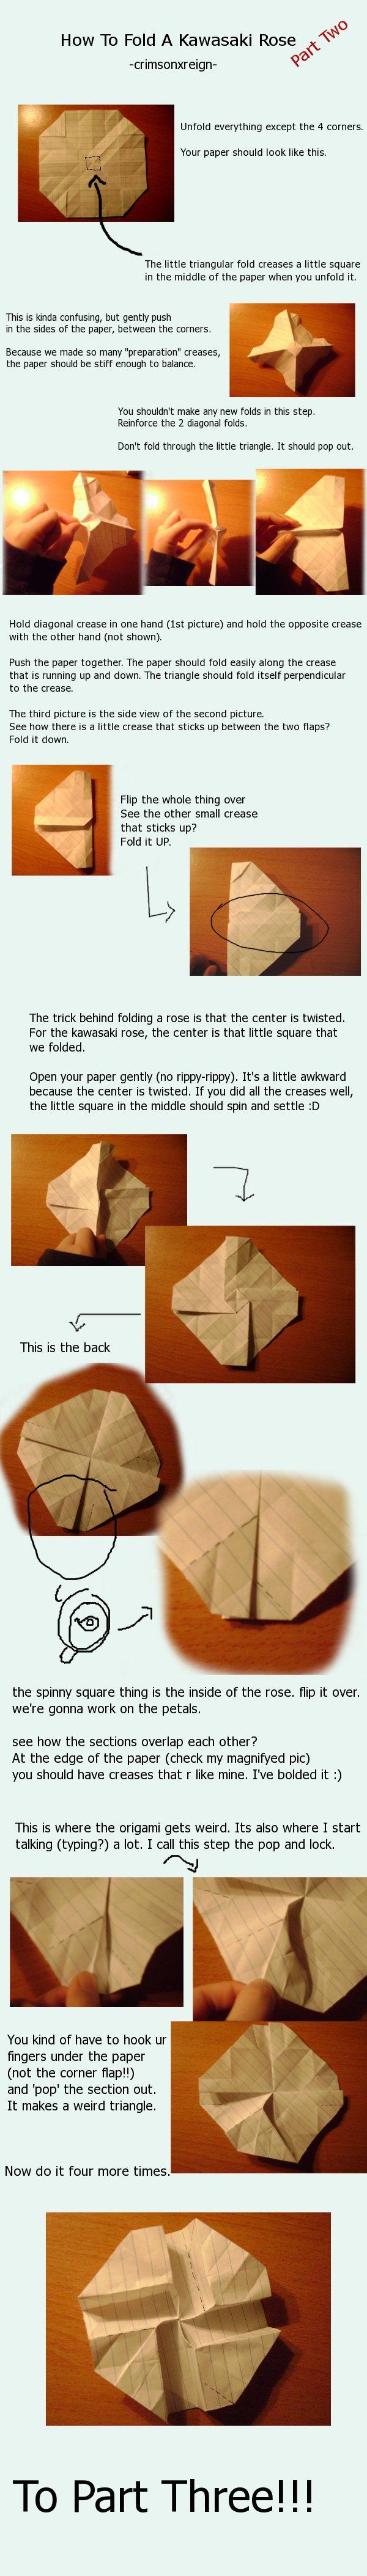 Rose Origami Tutorial Pt 2 By Crimsonxreign Origami Pinterest